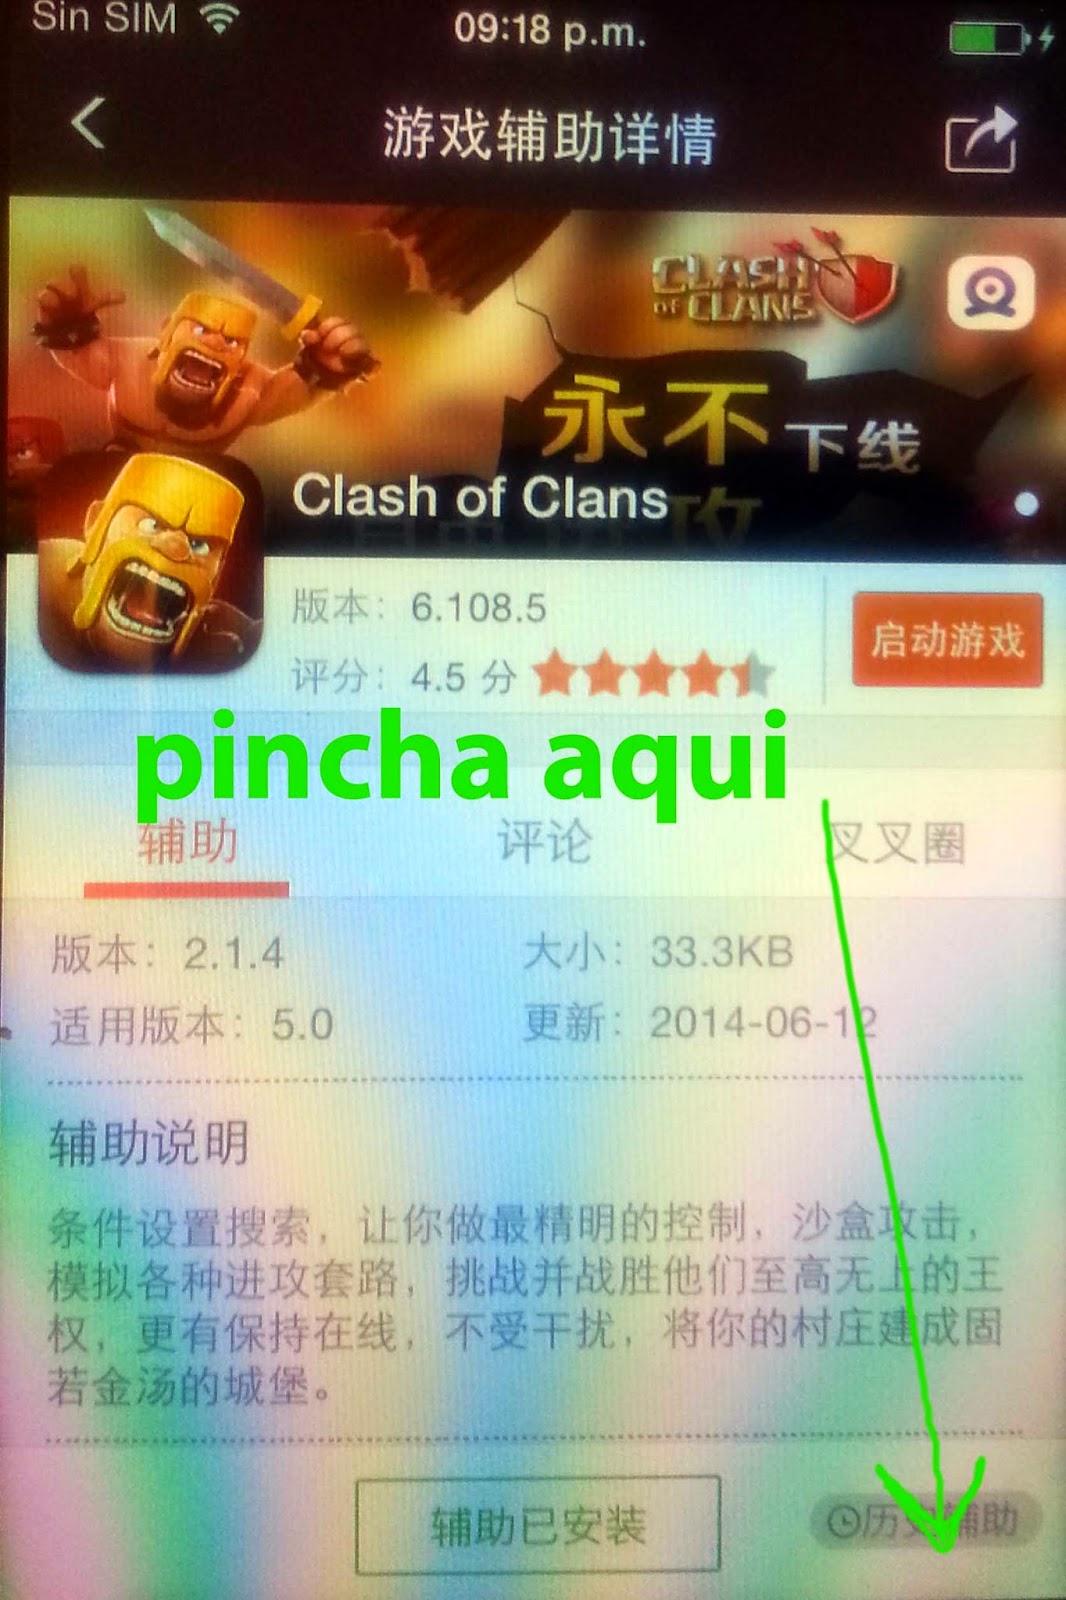 Clash of Clans APK + мод - Скачать Clash of Clans ...